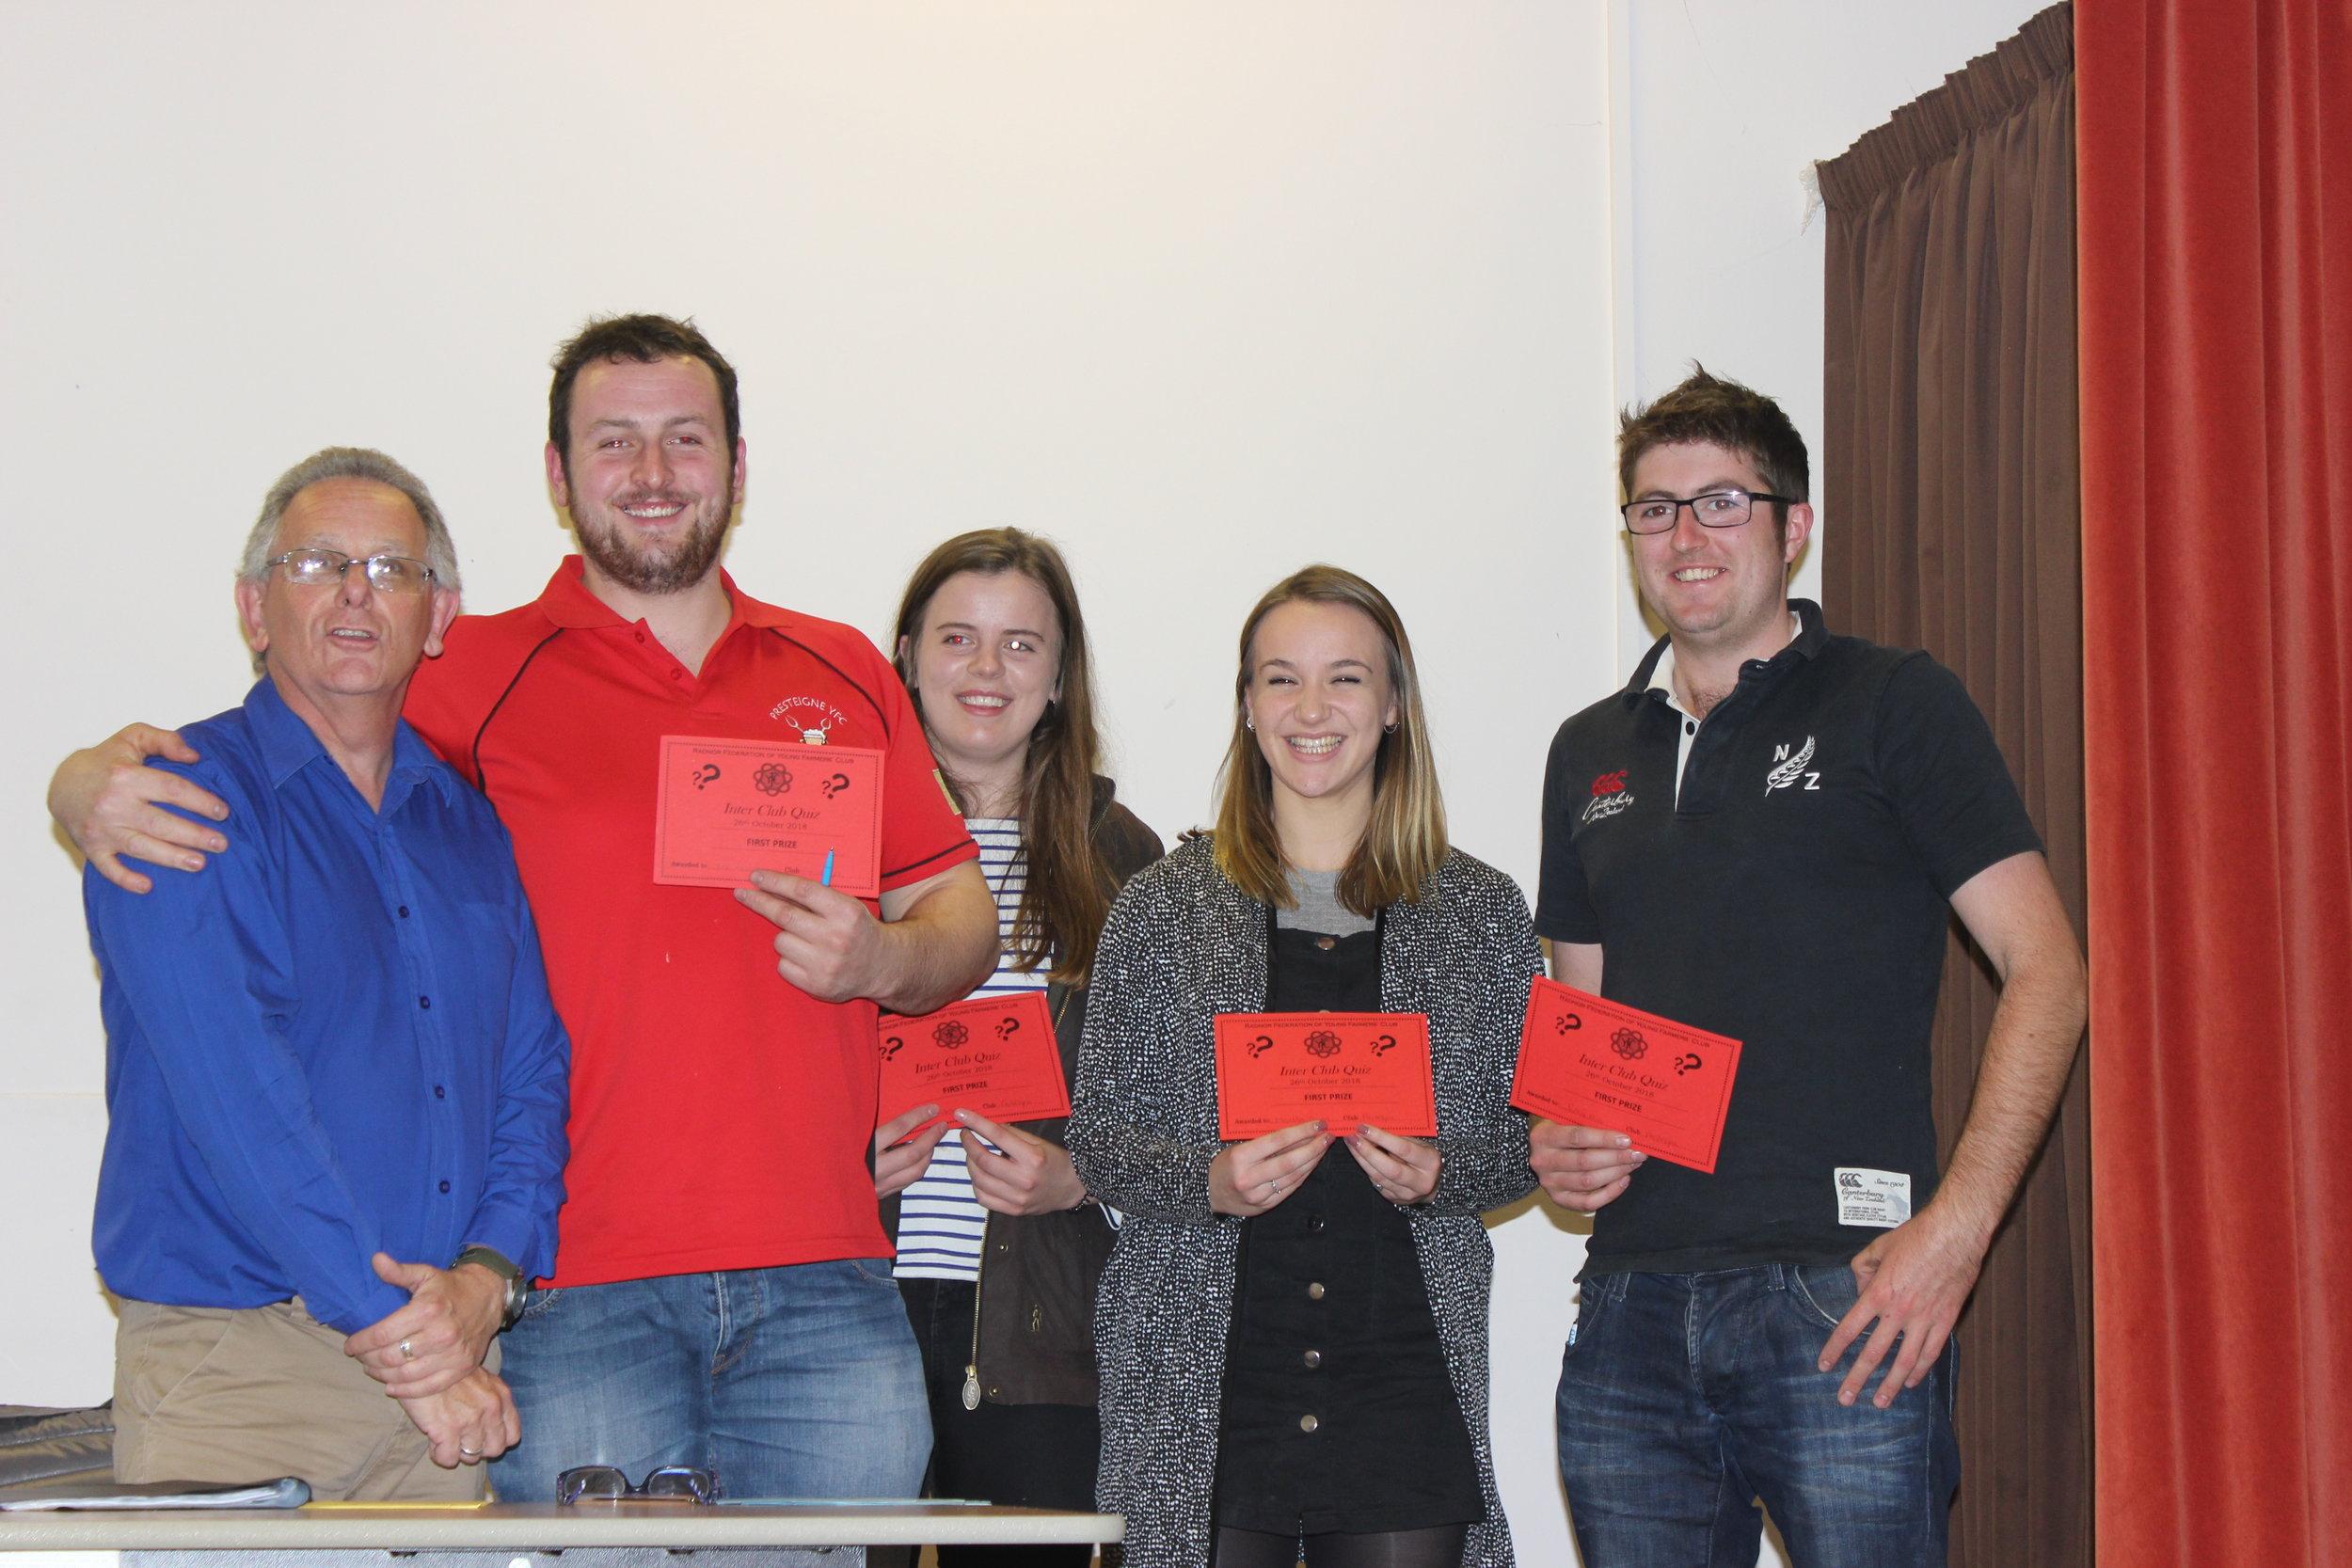 Inter Club Quiz winners Presteigne YFC with Quiz Master Michael Powell, (Ted Davies, Elizabeth Preston, Martha Bowen & Jamie Price)